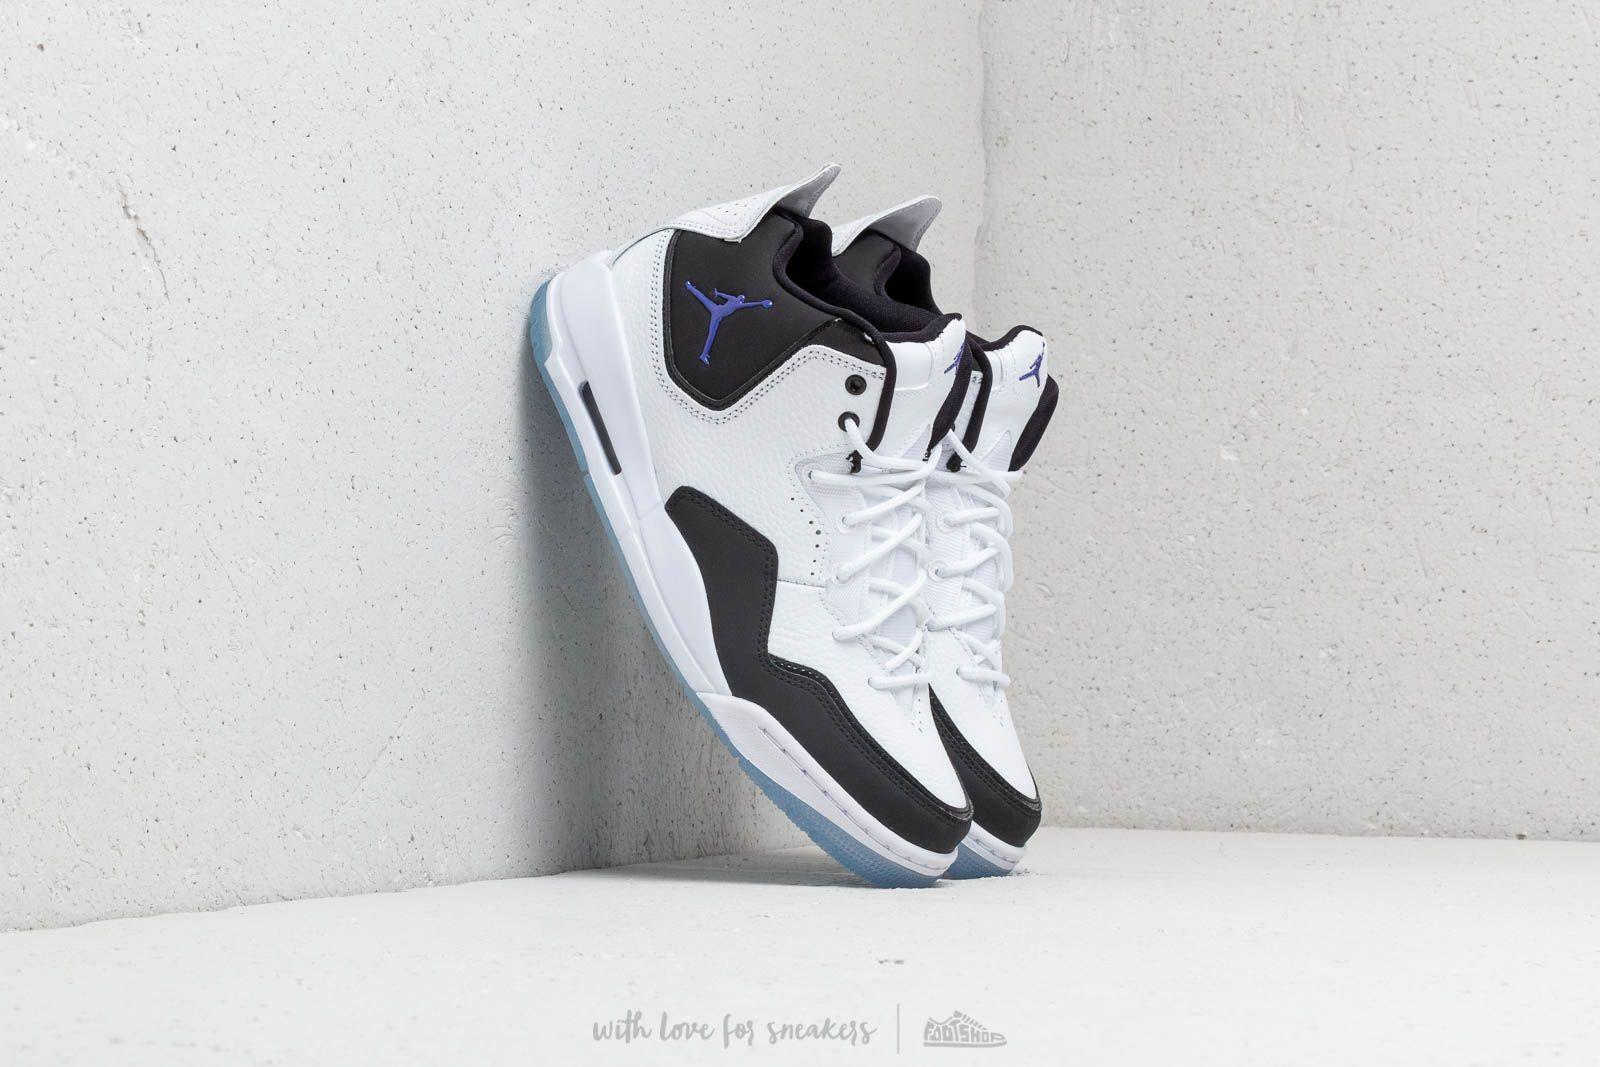 abacf604aad16b Jordan Courtside 23 White  Dark Concord-Black